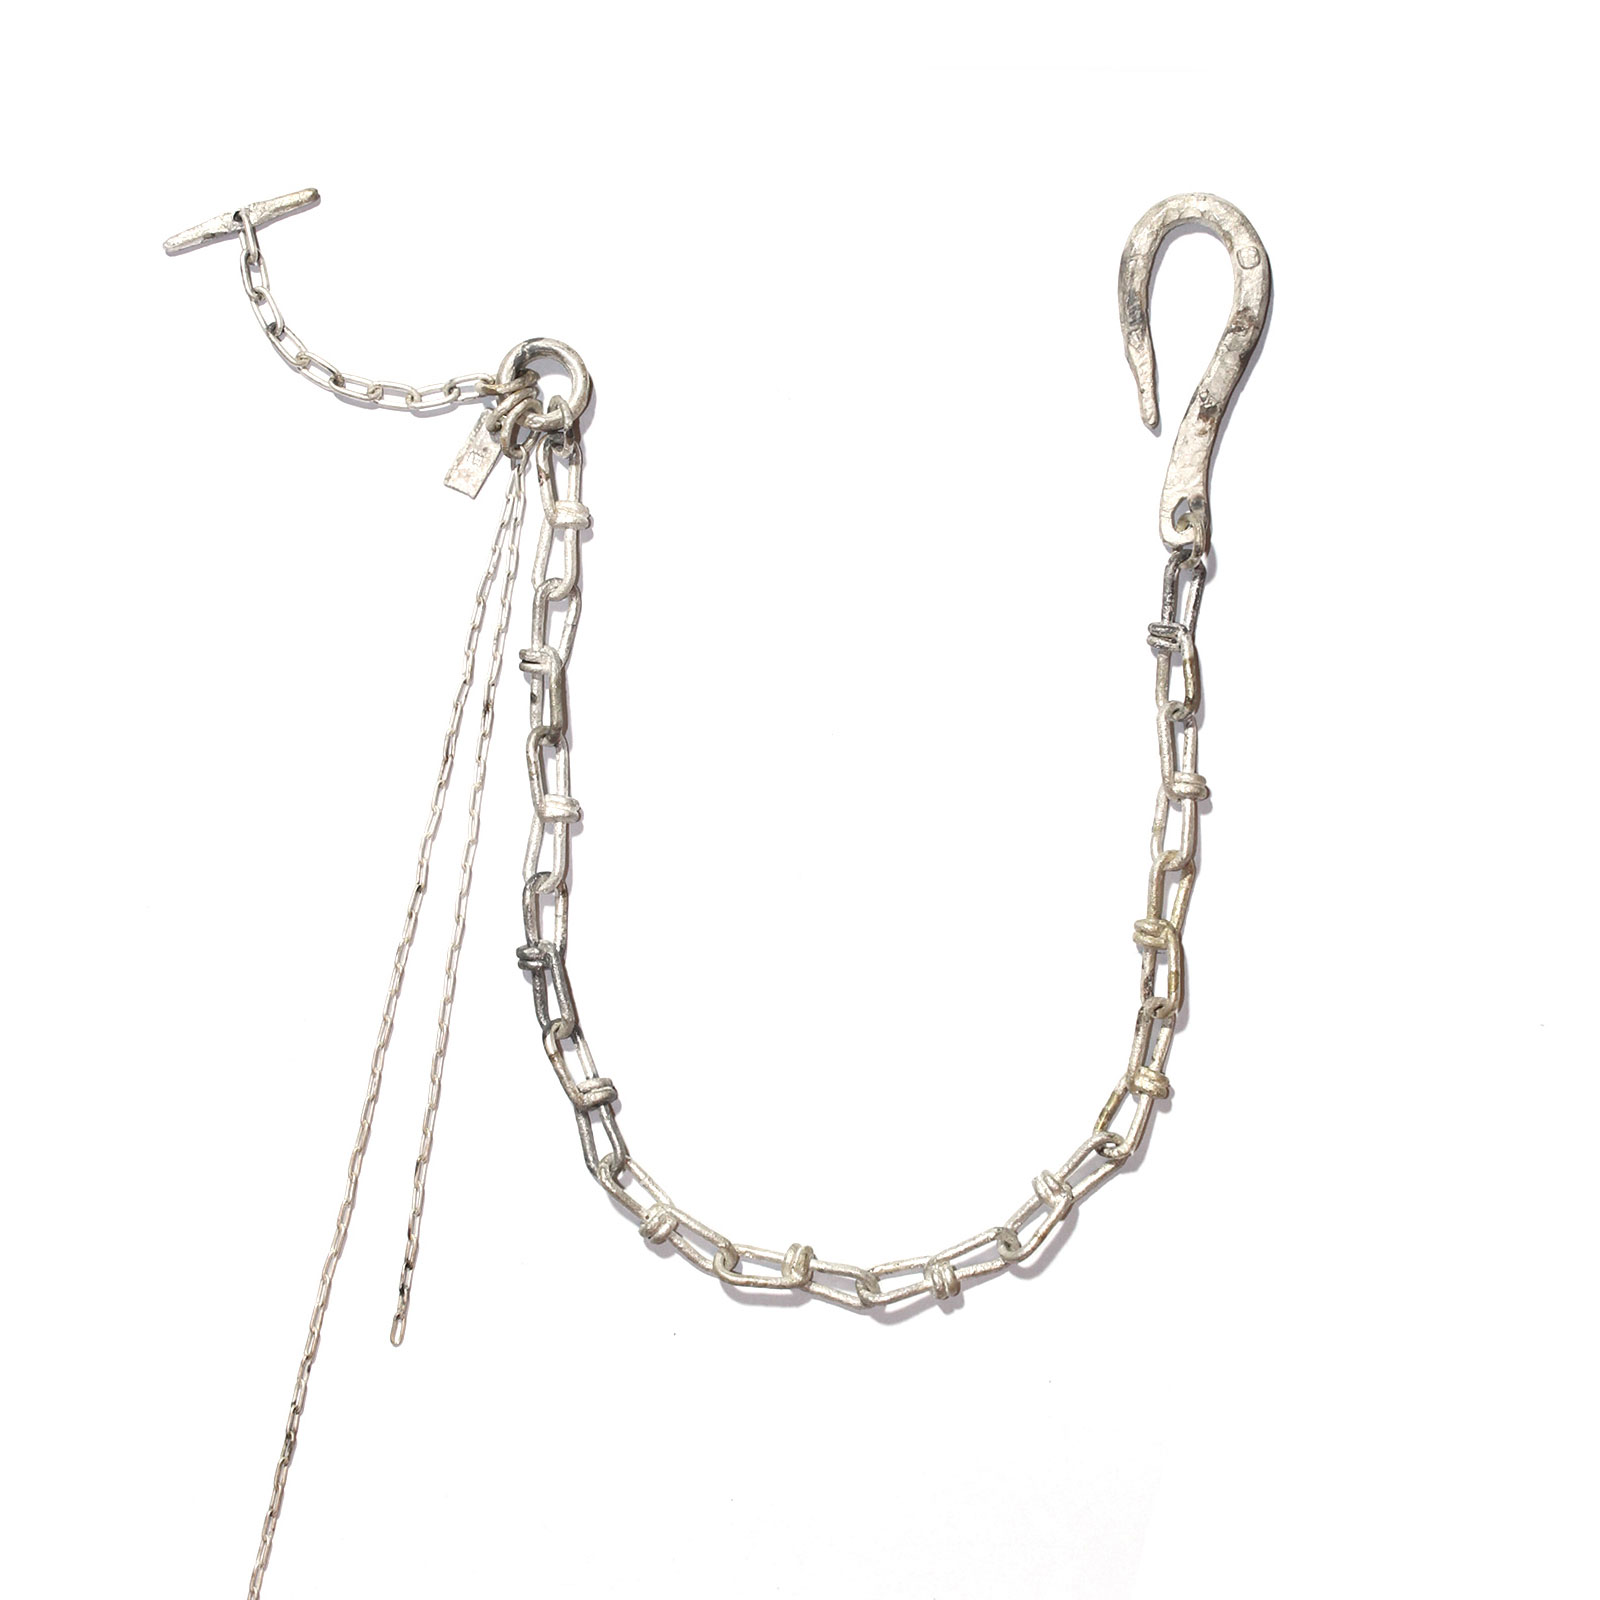 KnotChain key chain